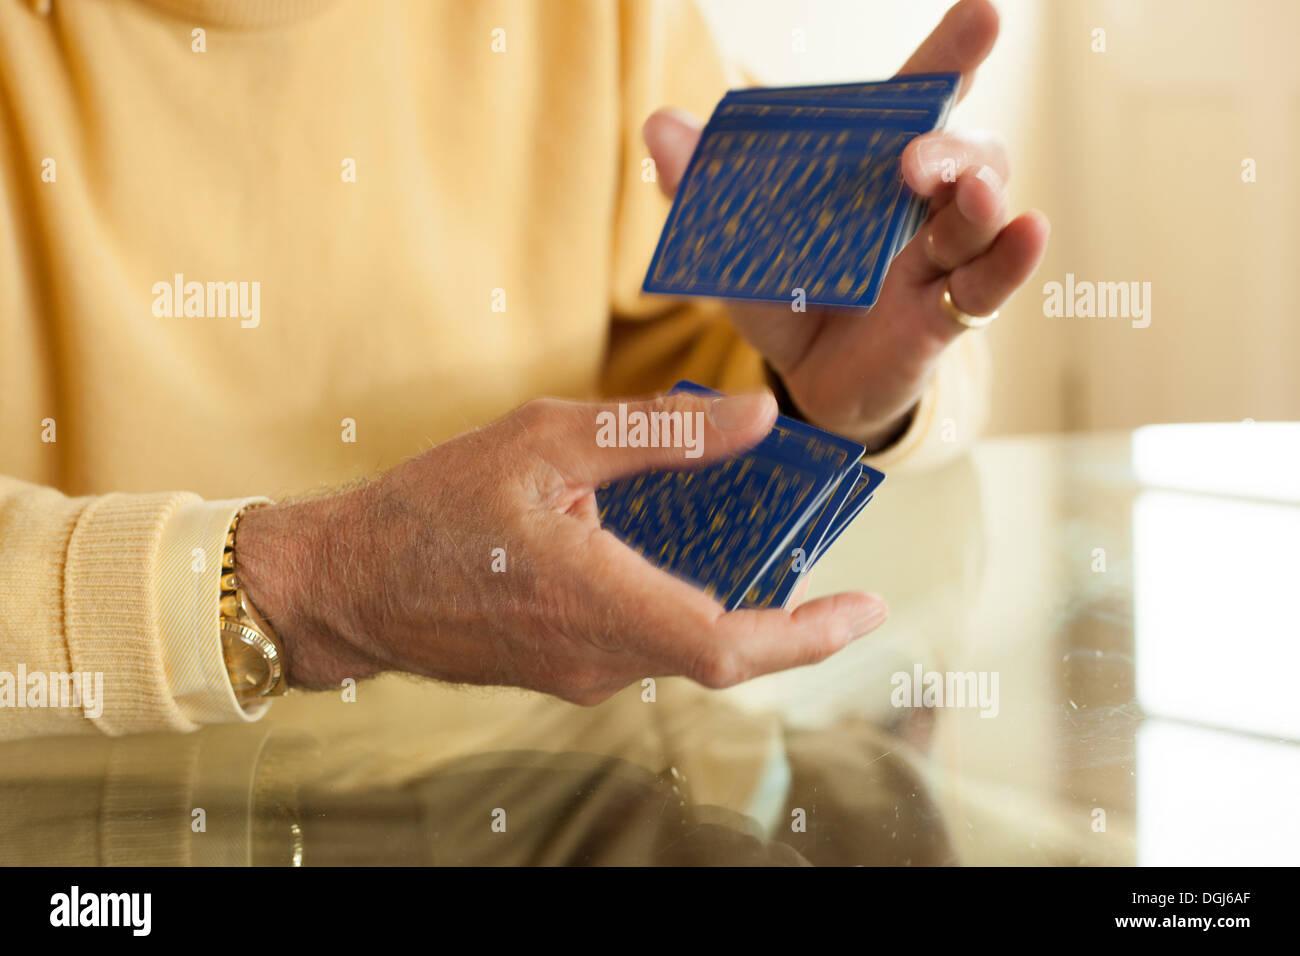 Cerca de ancianos manos barajar cartas Imagen De Stock